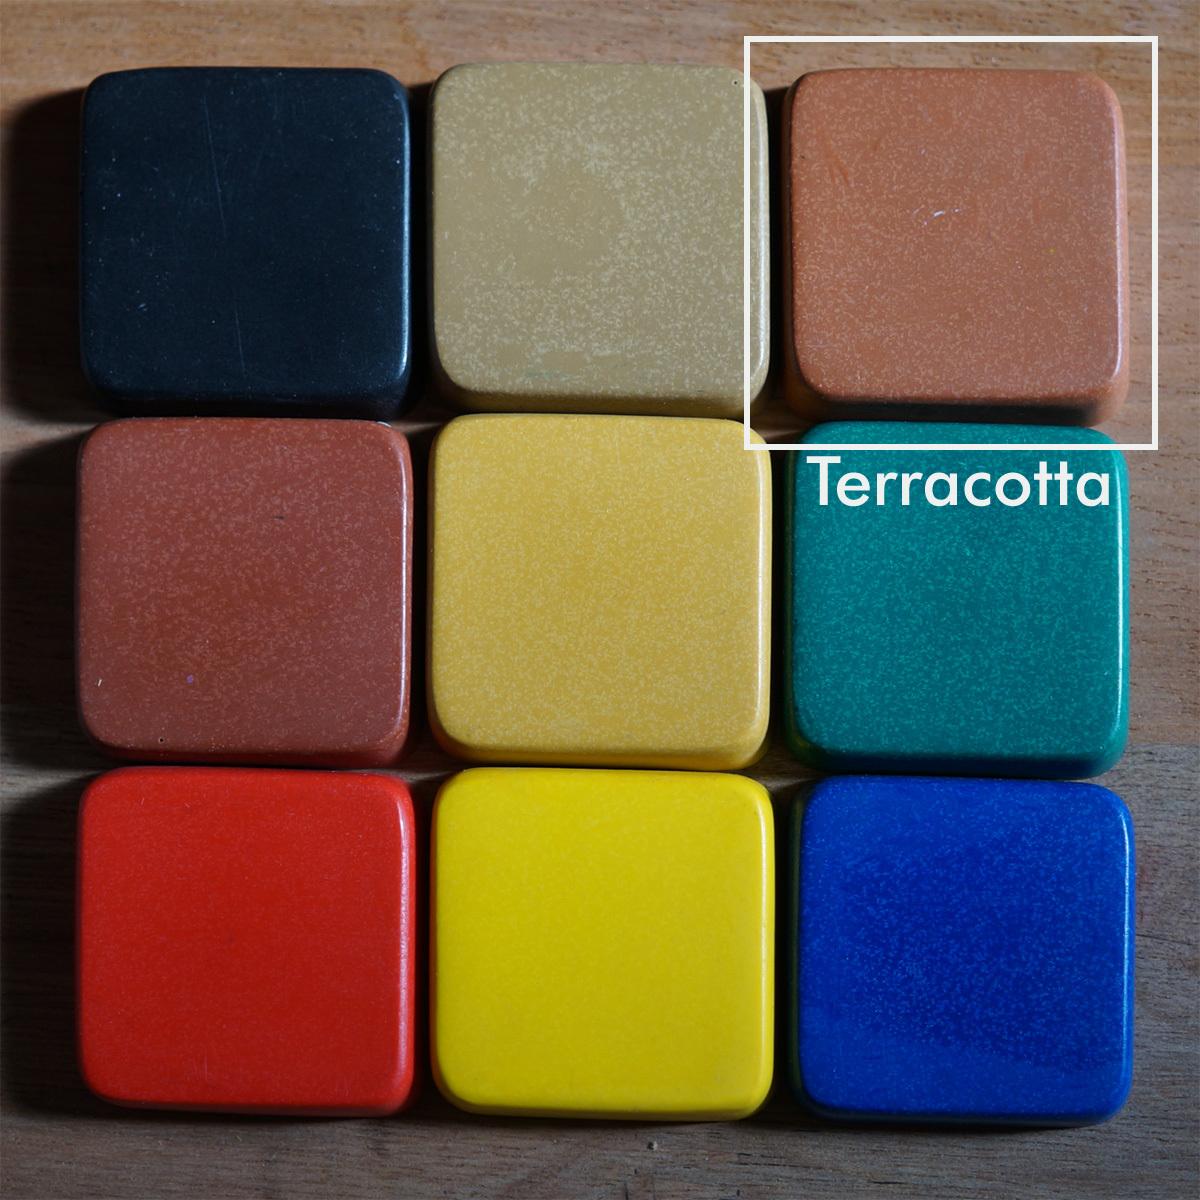 PIGMENT TERRACOTTA 200g(着色剤:テラコッタ 200g) - 画像2